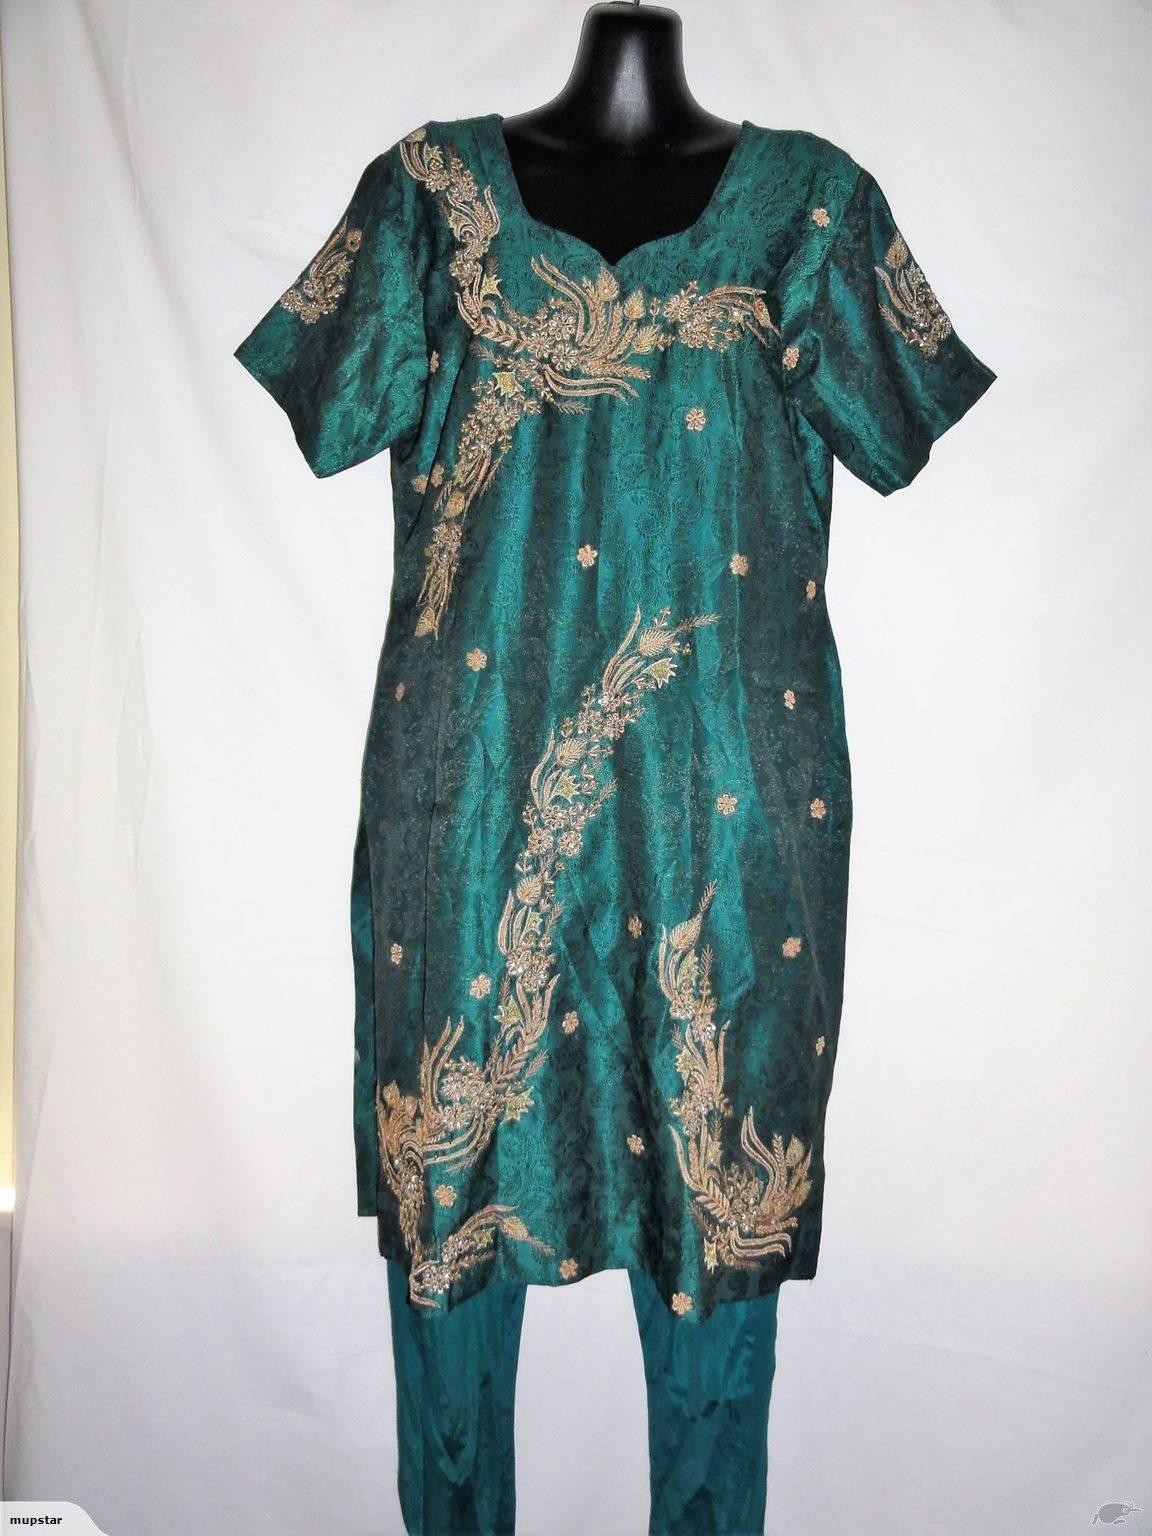 5a3e4fe5c63 Indian Dress Emerald green tunic+pants 2 piece s10-12 | Trade Me